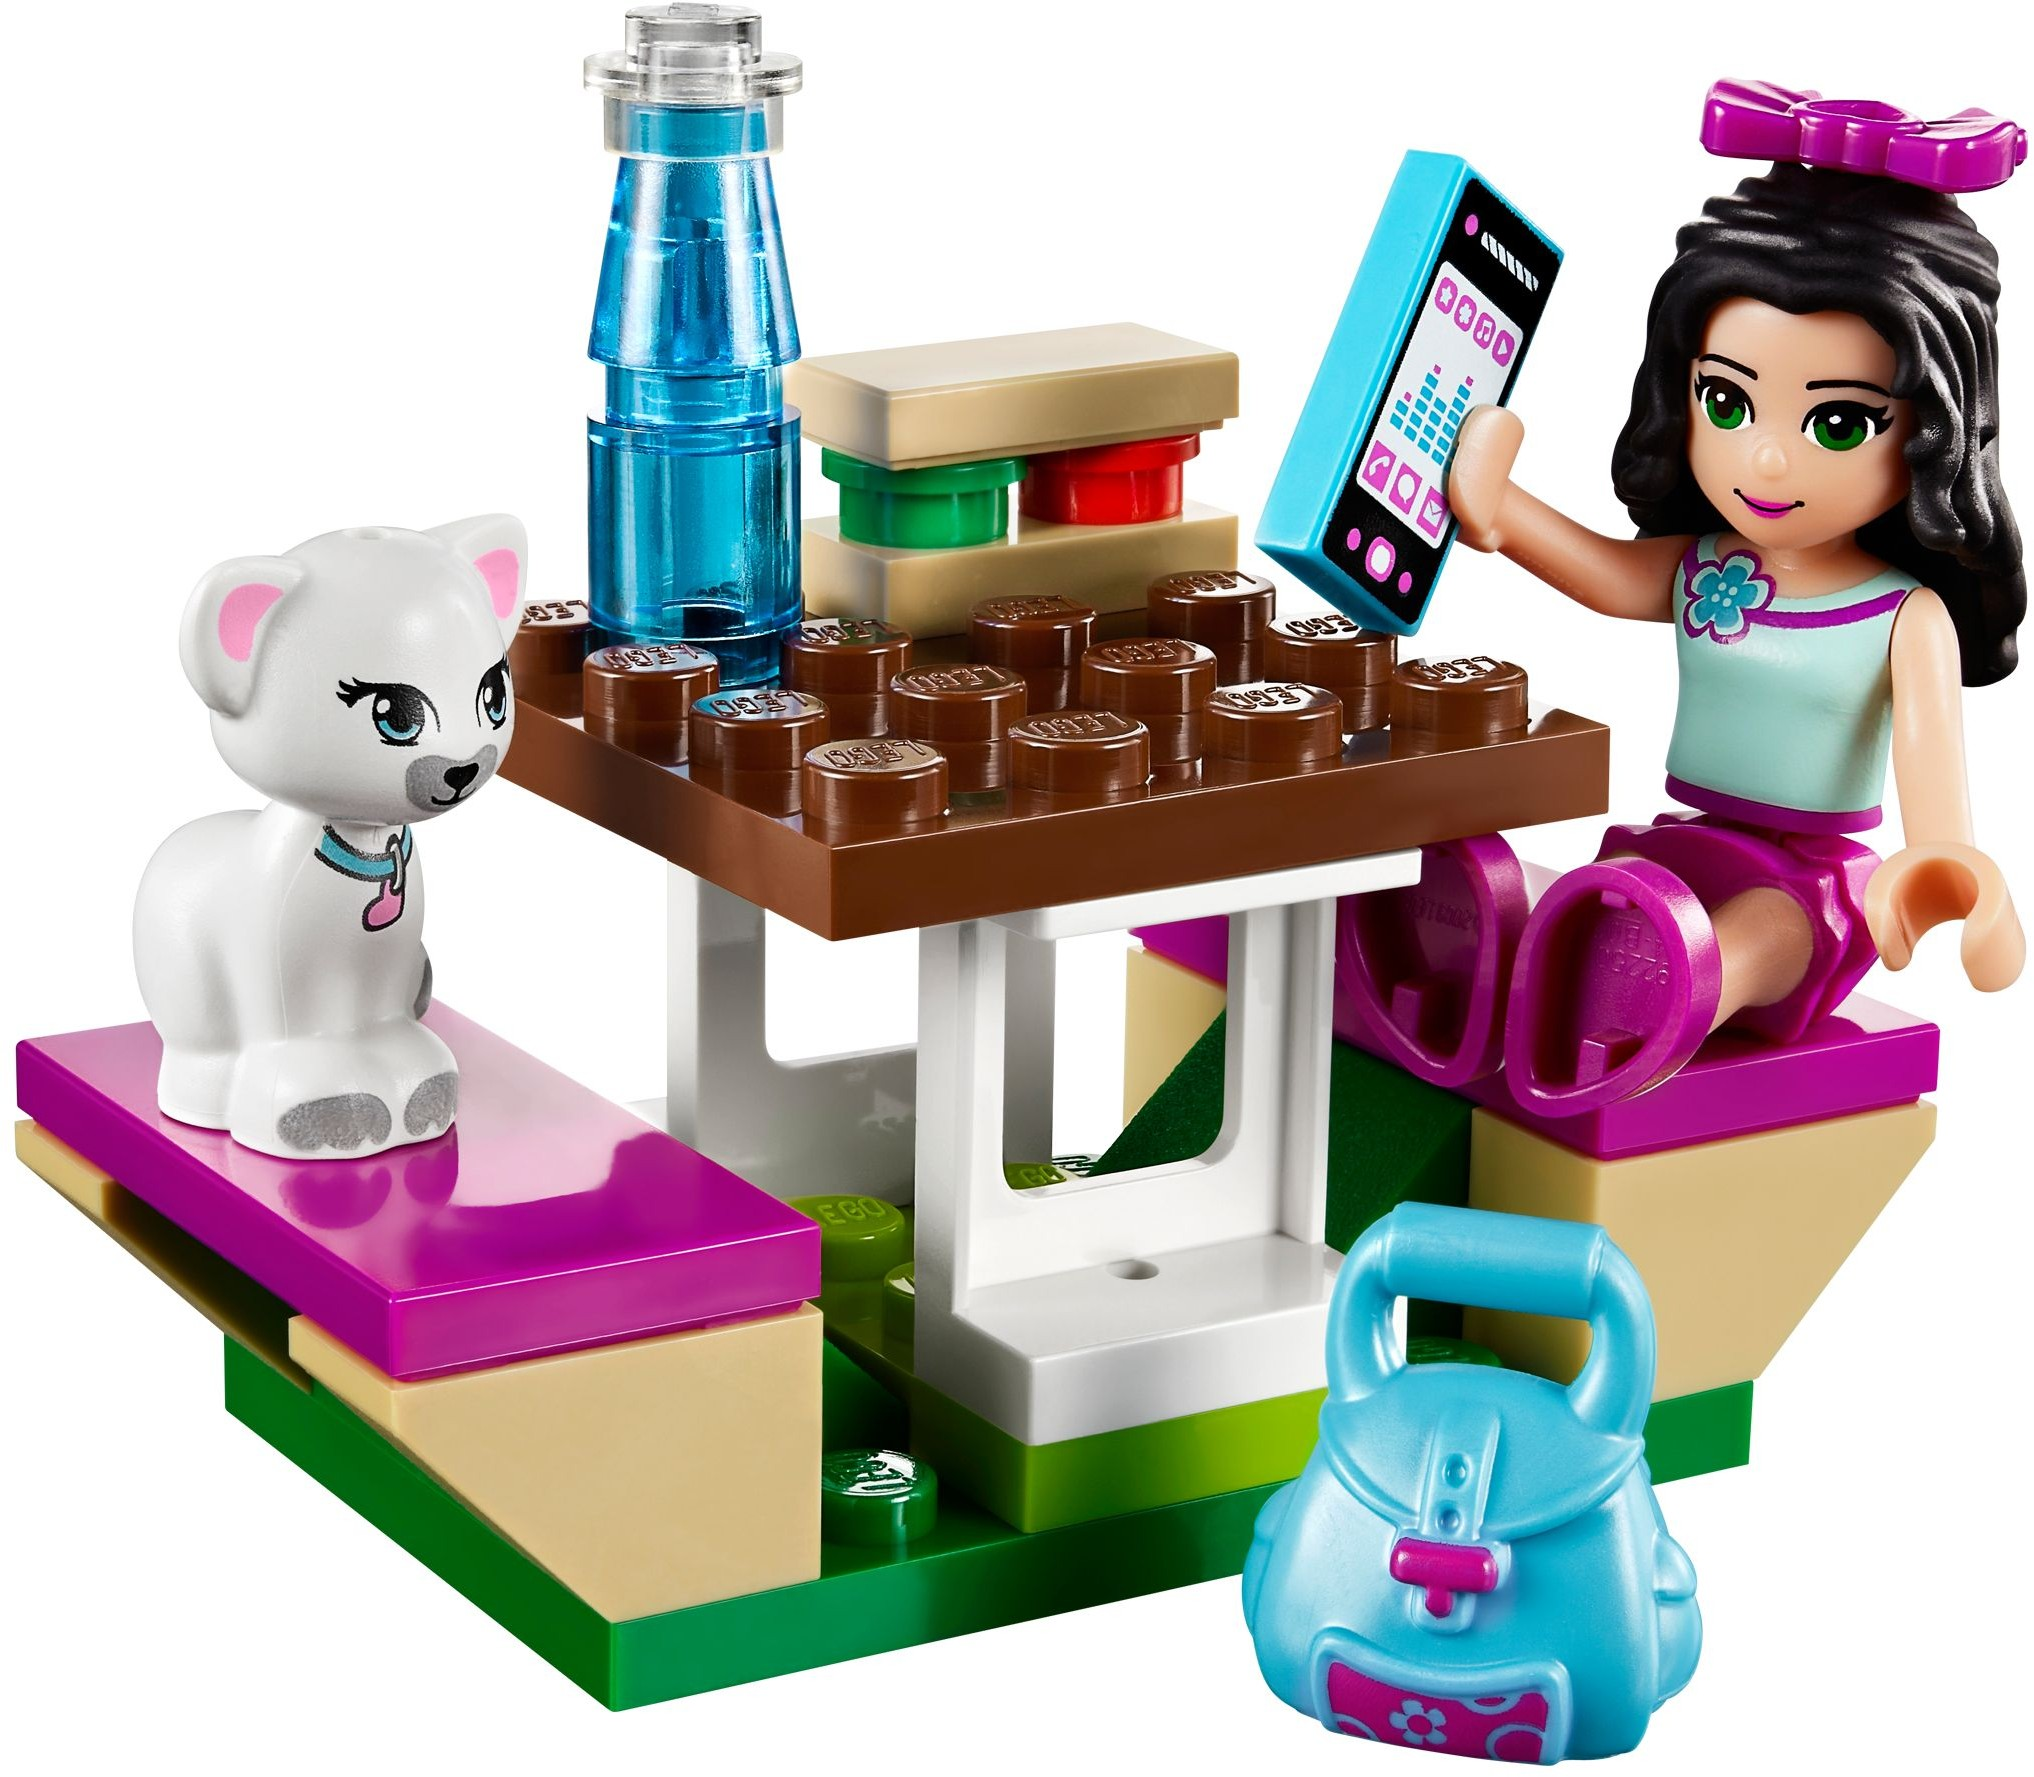 File:LEGO Friends Emma's Sports Car 41013 3.jpg